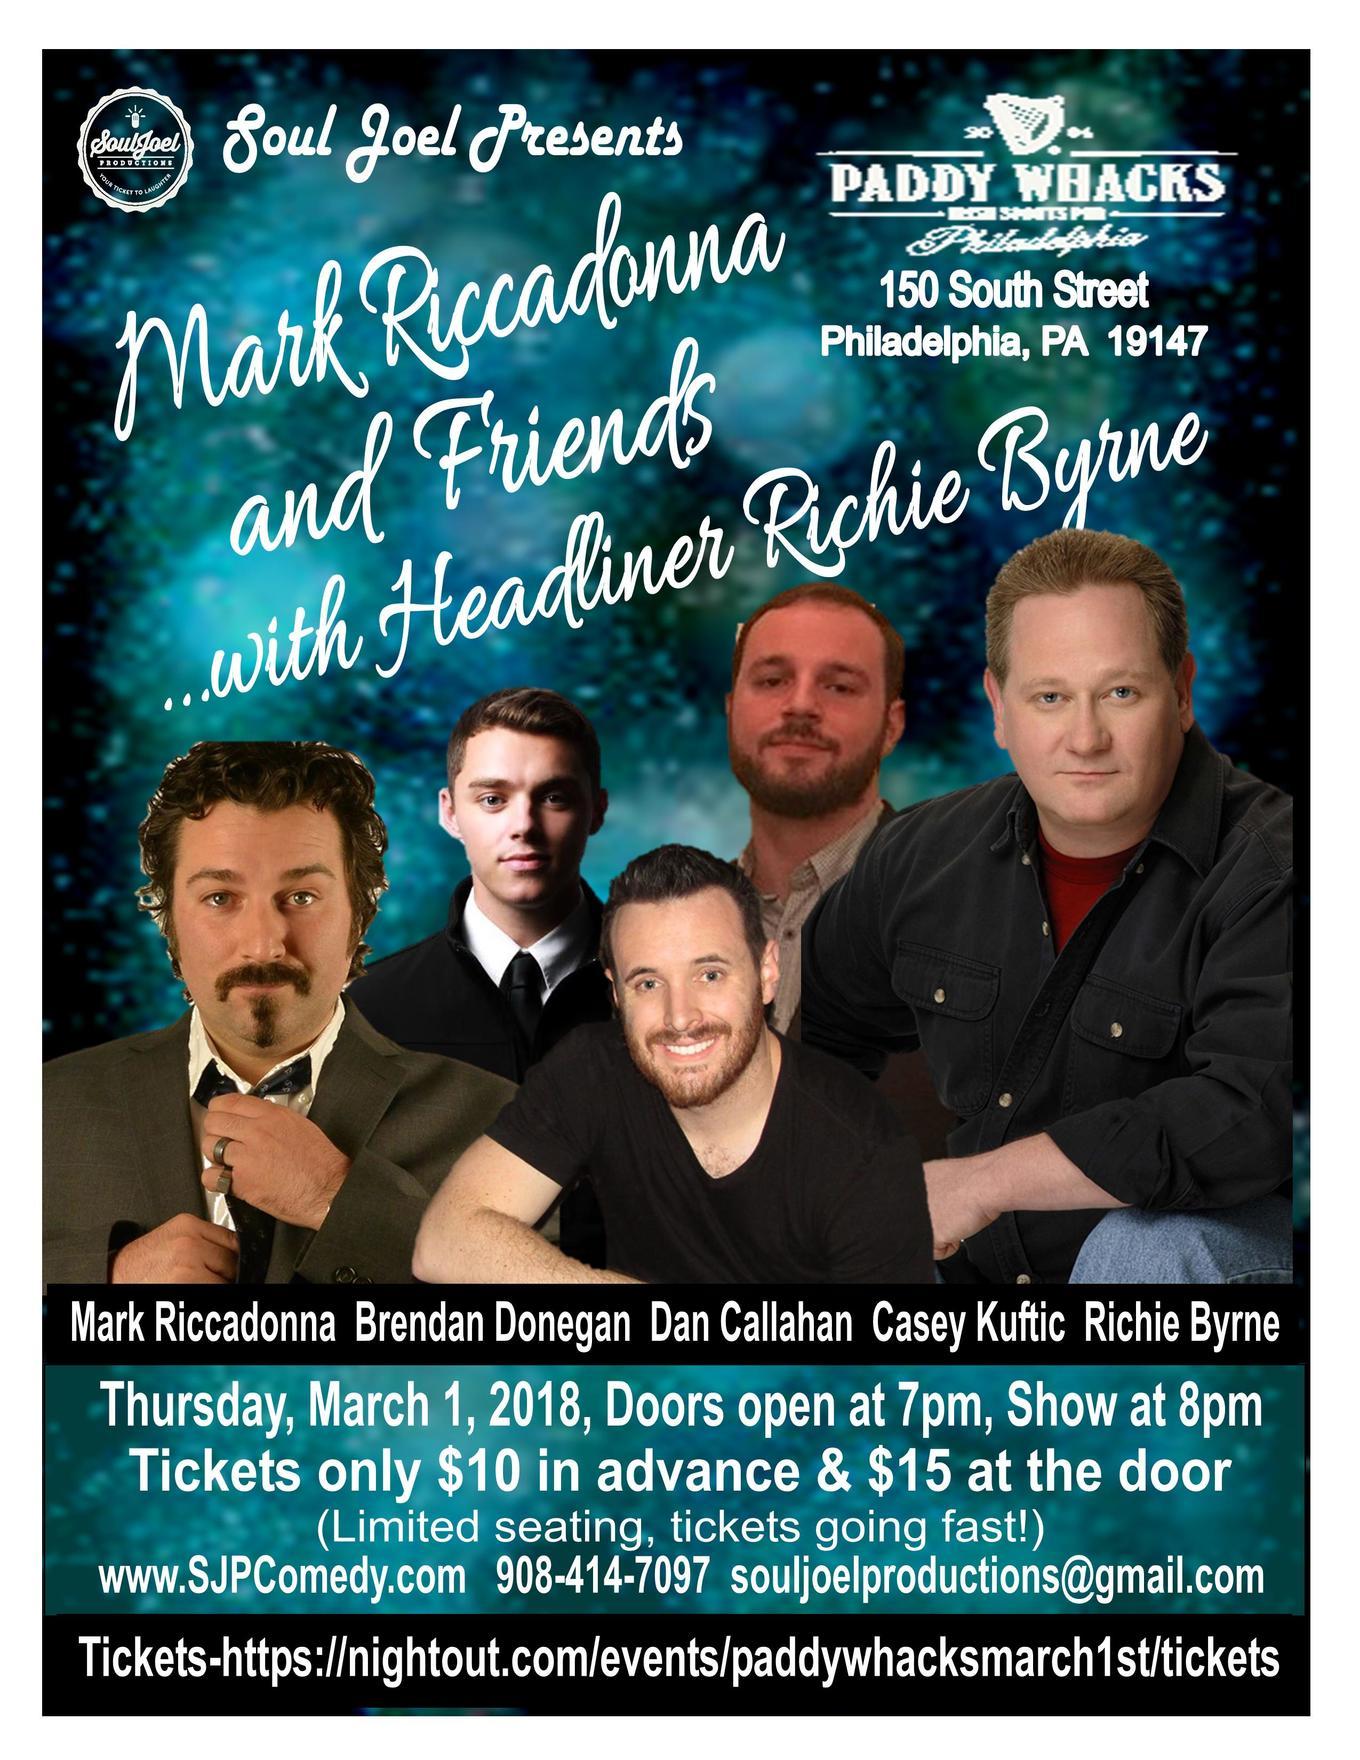 Philadelphia Mark Riccadonna and Friends  sc 1 st  NIGHTOUT & Philadelphia: Mark Riccadonna and Friends - Tickets - Paddy ...